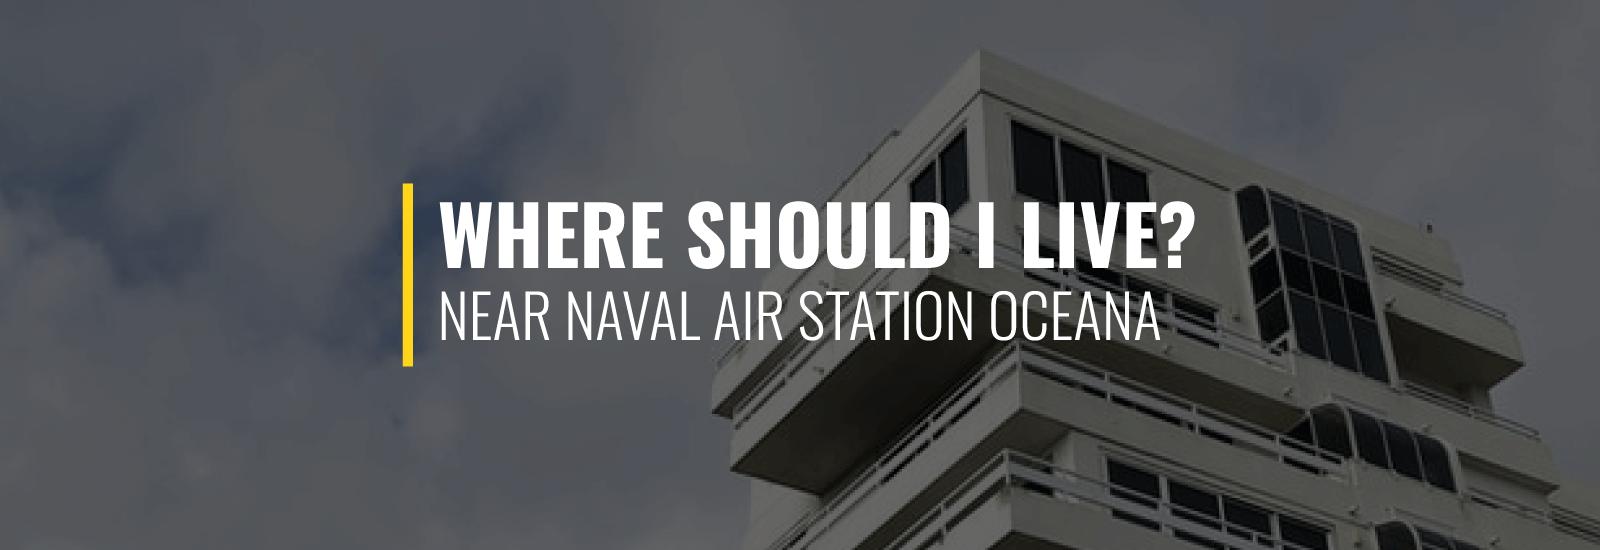 Where Should I Live Near NAS Oceana?